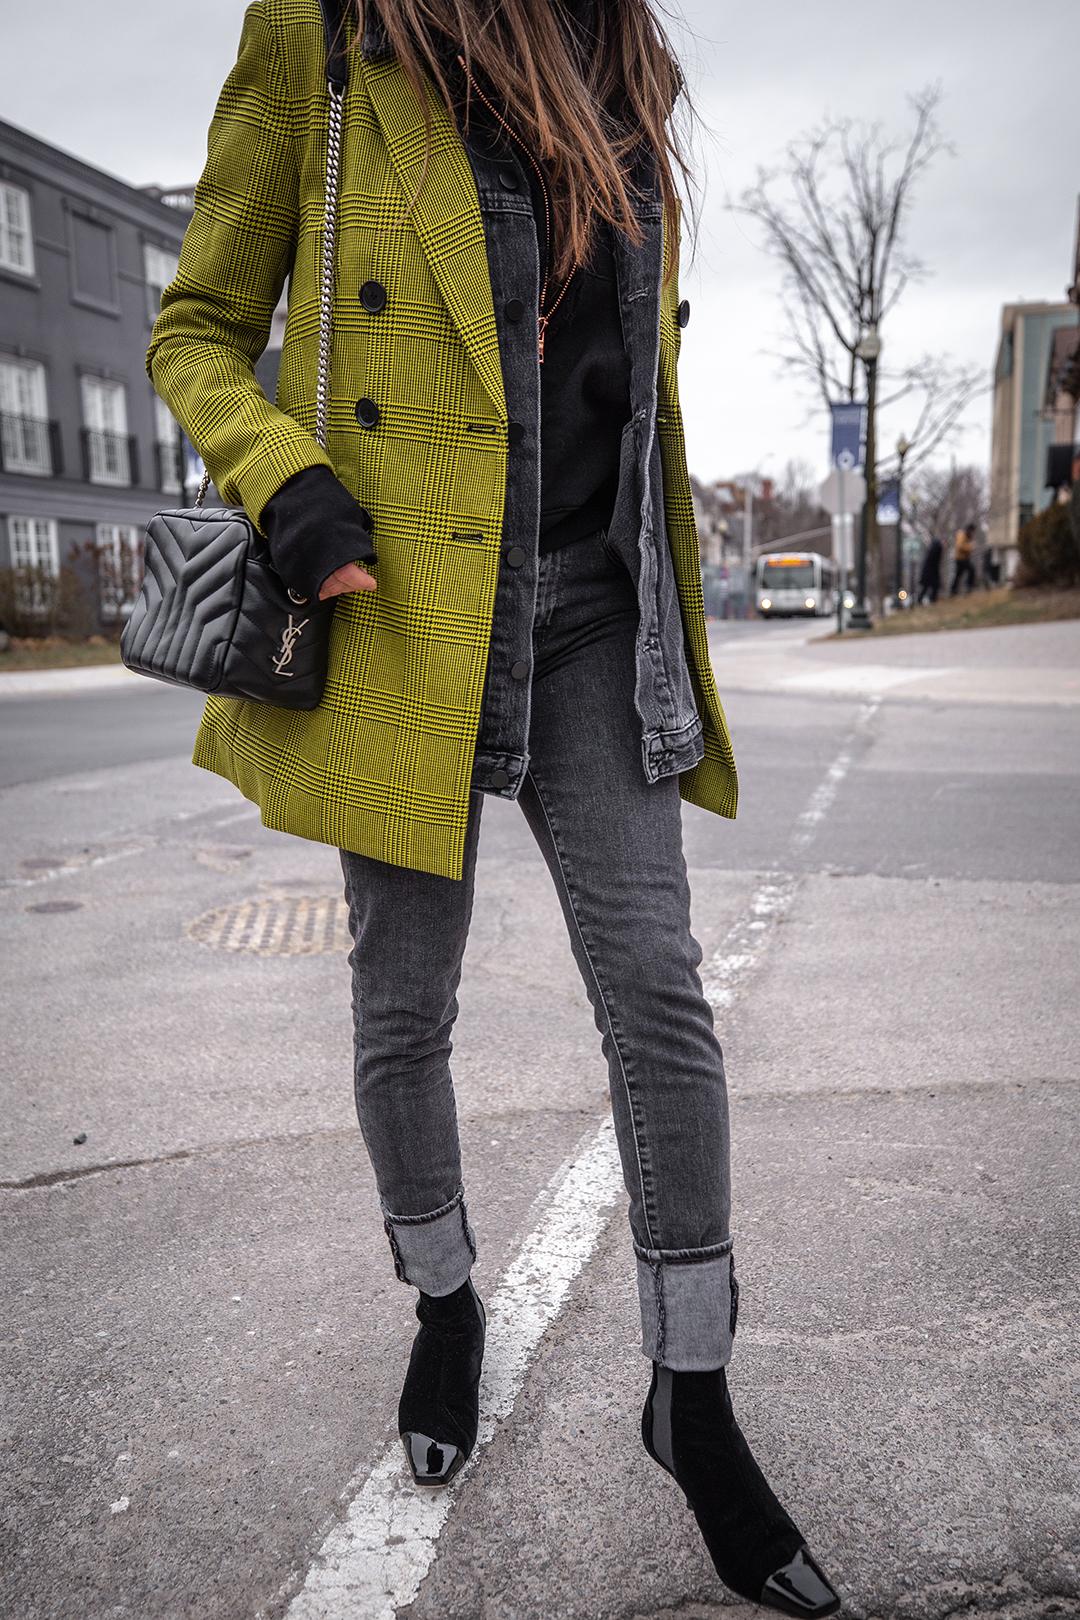 Nathalie Martin, Robert Rodriguez yellow plaid houndstooth blazer, Balenciaga logo beanie hat, Loewe velvet patent leather boots, grey jeans, Alexander Wang denim vest, Frank & Eileen hoodie, Saint Laurent LouLou bag, streetstyle woahstyle.com_6075.jpg